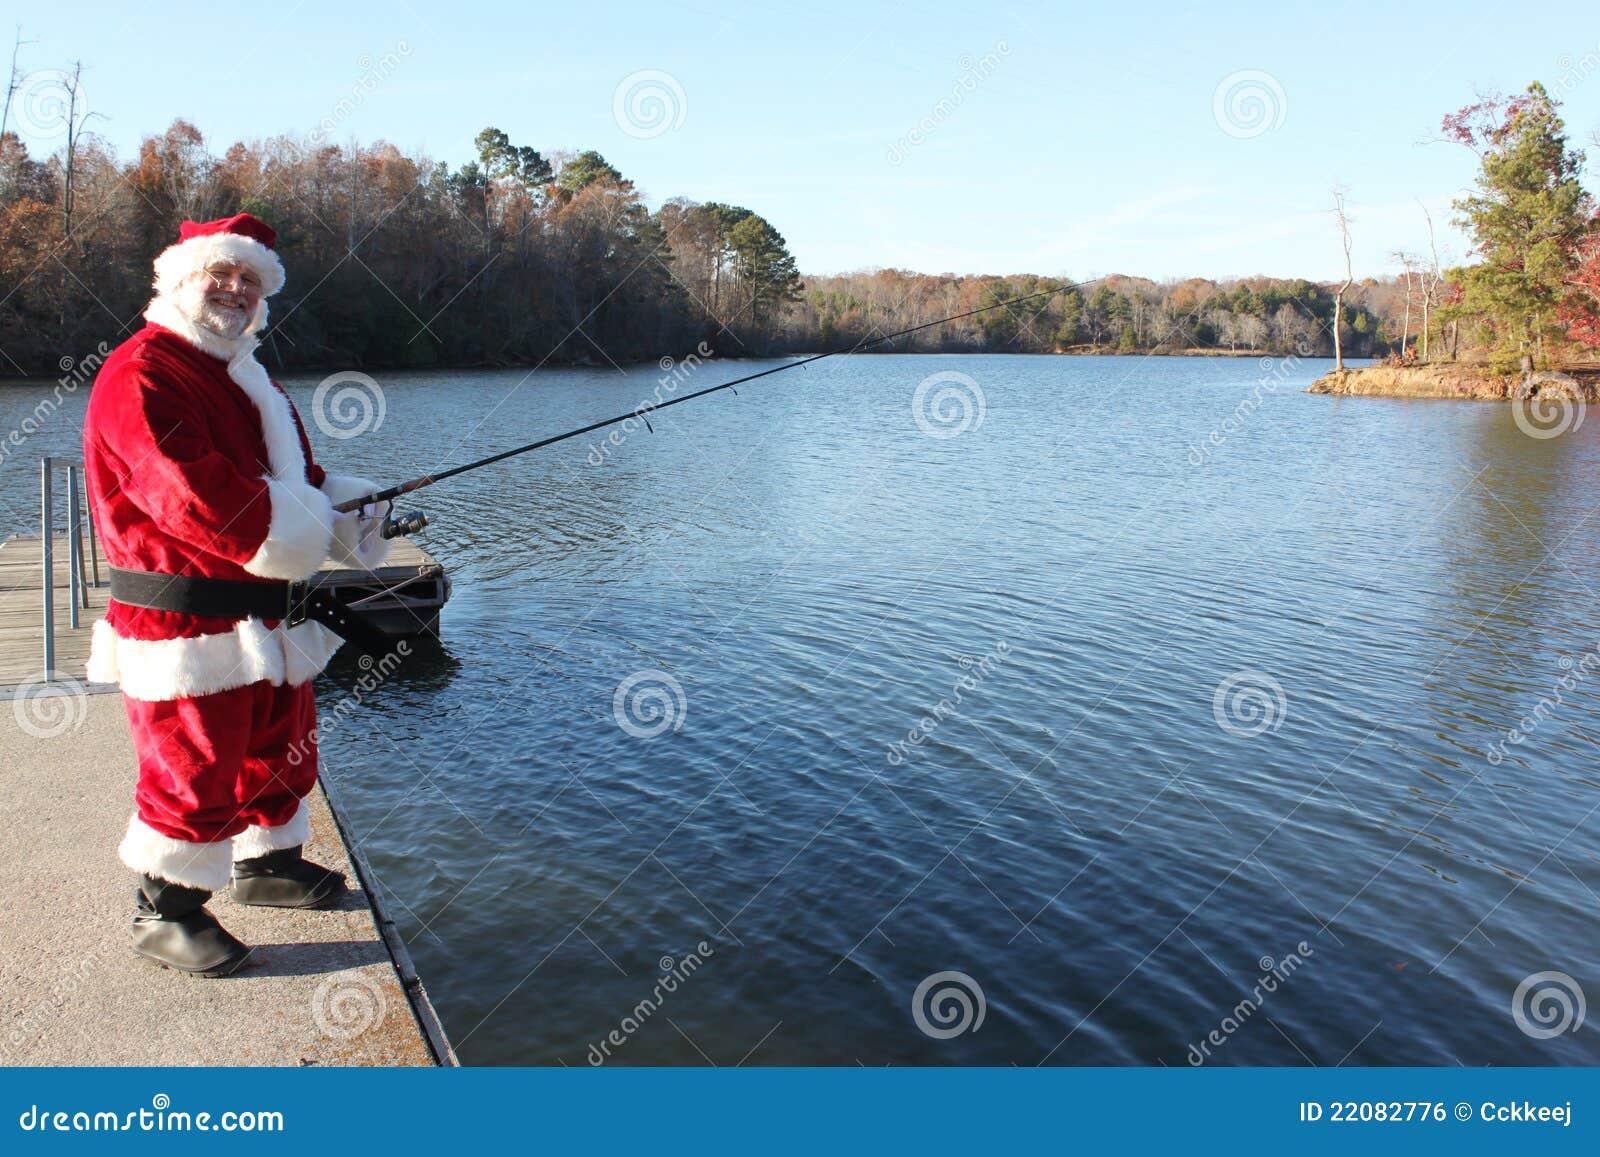 fishing santa royalty free stock image image 22082776